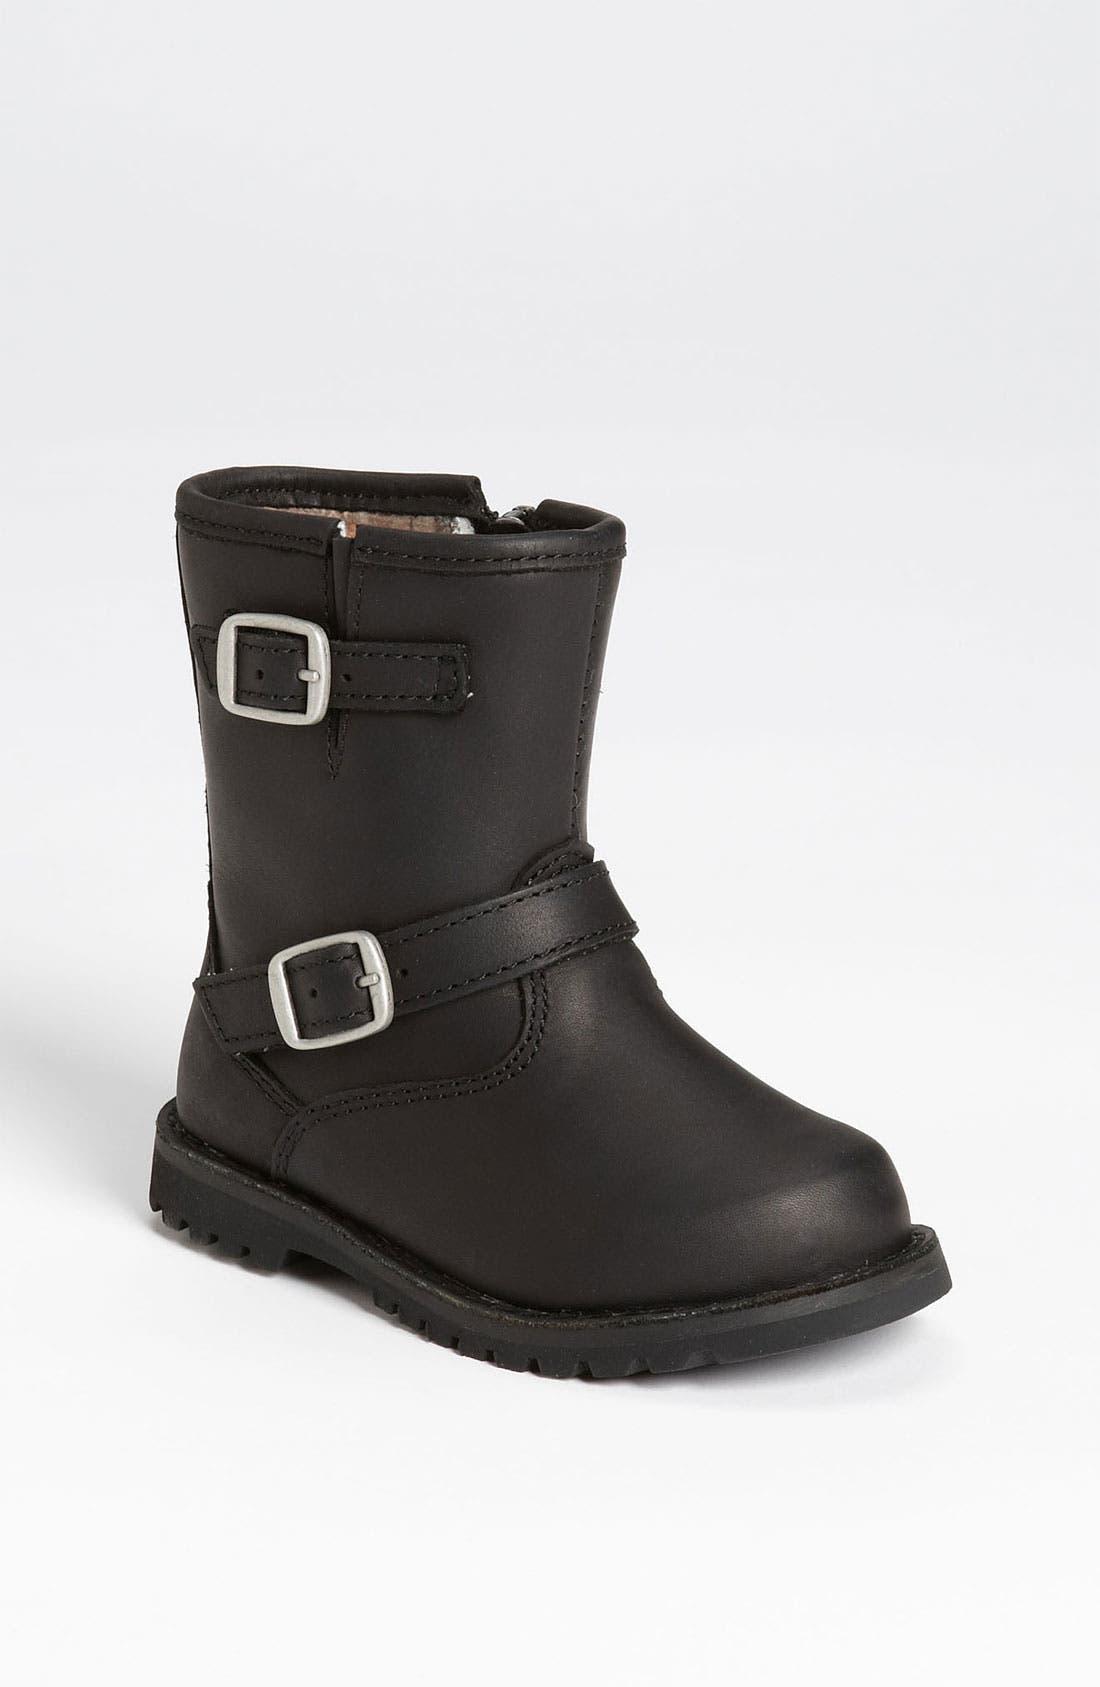 Main Image - UGG® 'Harwell' Boot (Walker & Toddler)